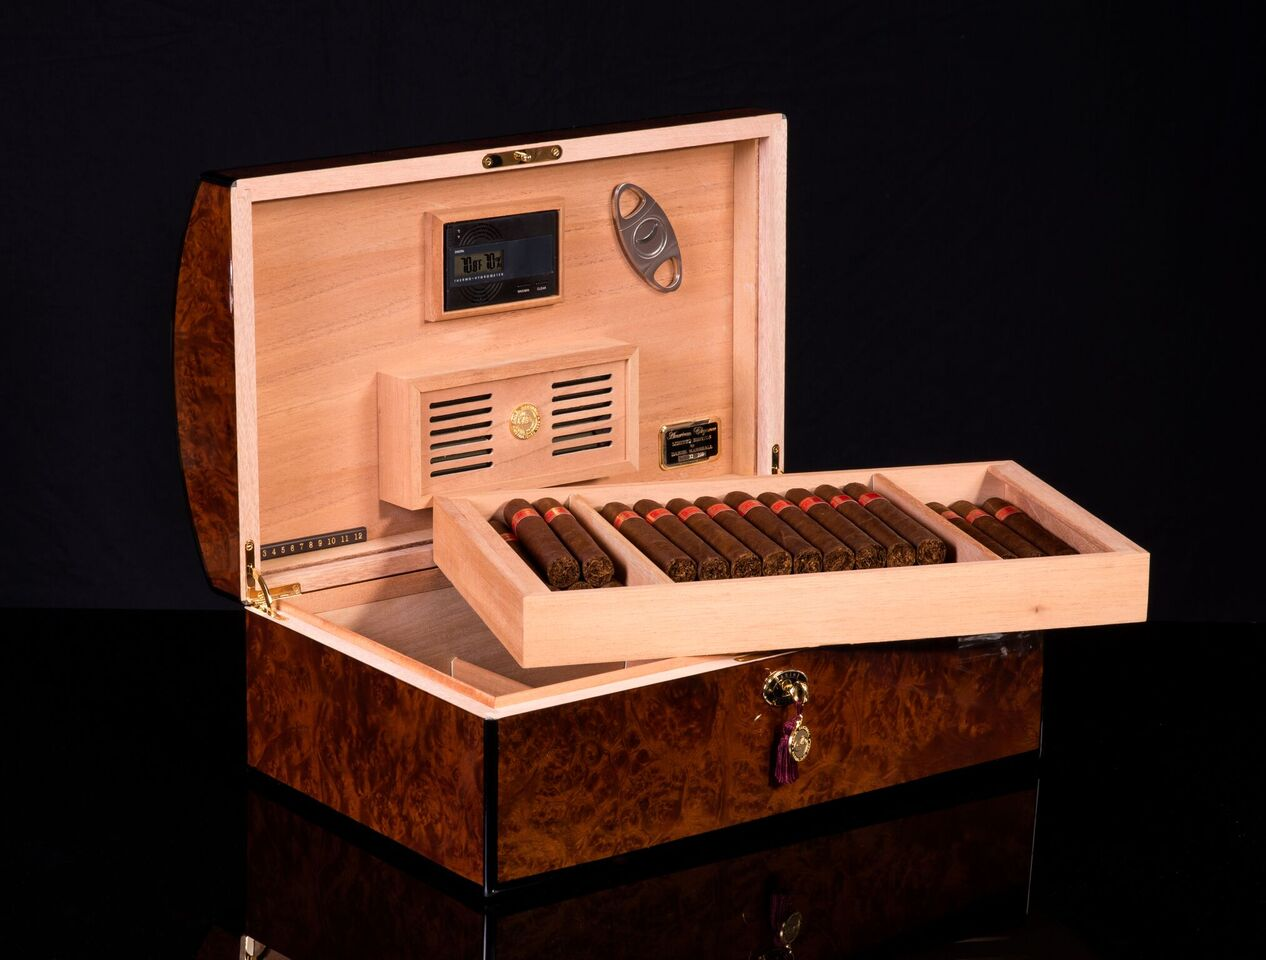 daniel marshall 10085 Treasure chest (1)